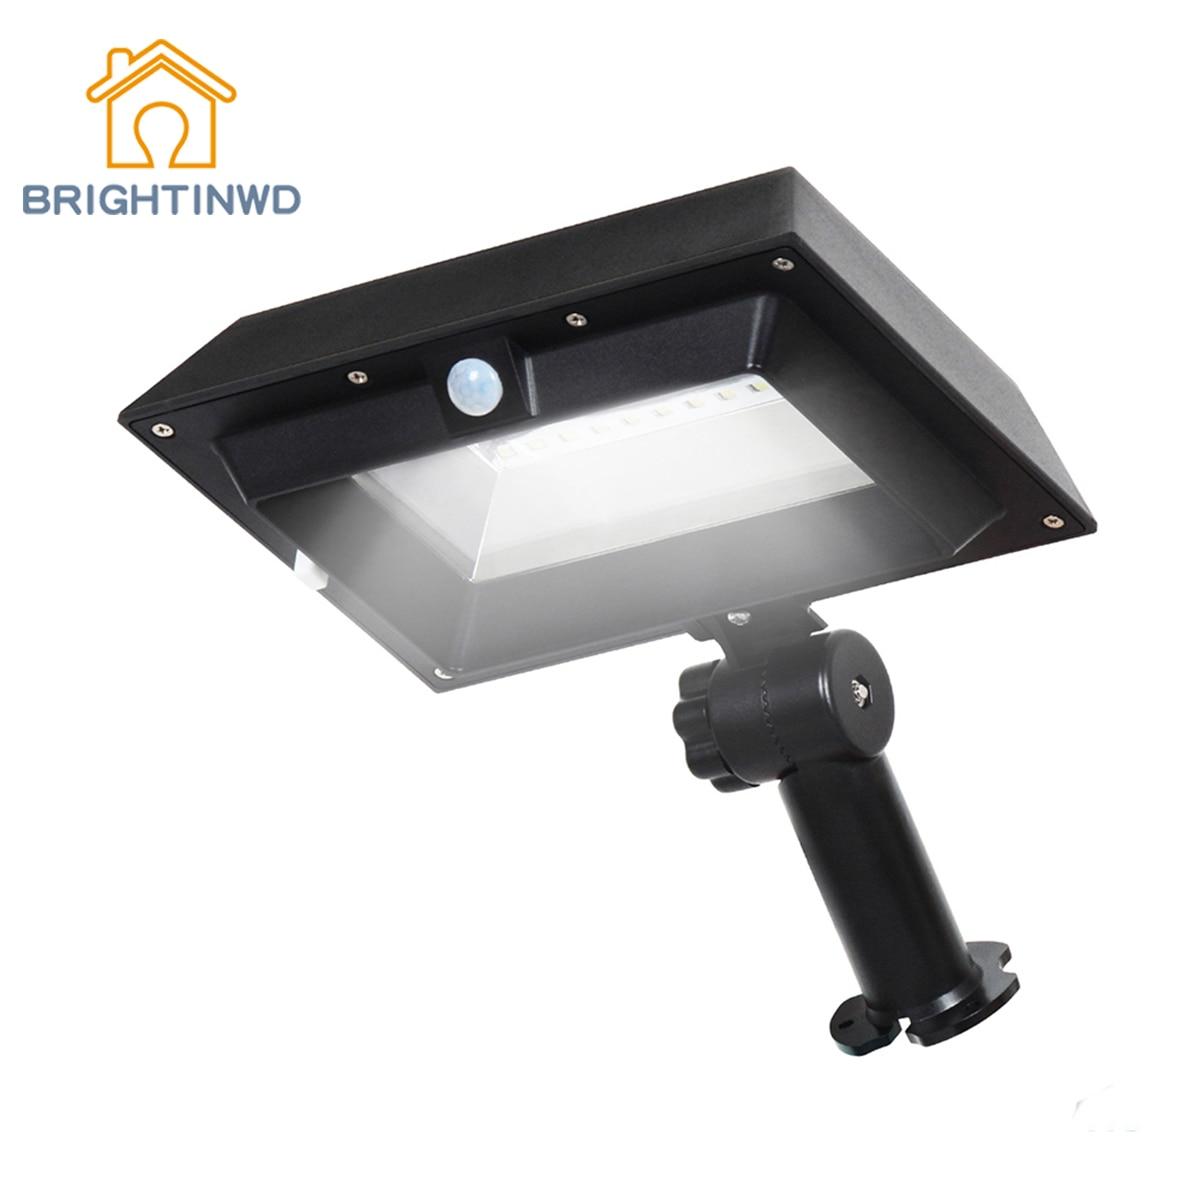 PIR Motion Sensor LED Solar Wall Light IP44 Waterproof 30 LED Solar Street Light Garden Gutter Light Solar Light BRIGHTINWD декоративні лампи із дерева у стилі бра